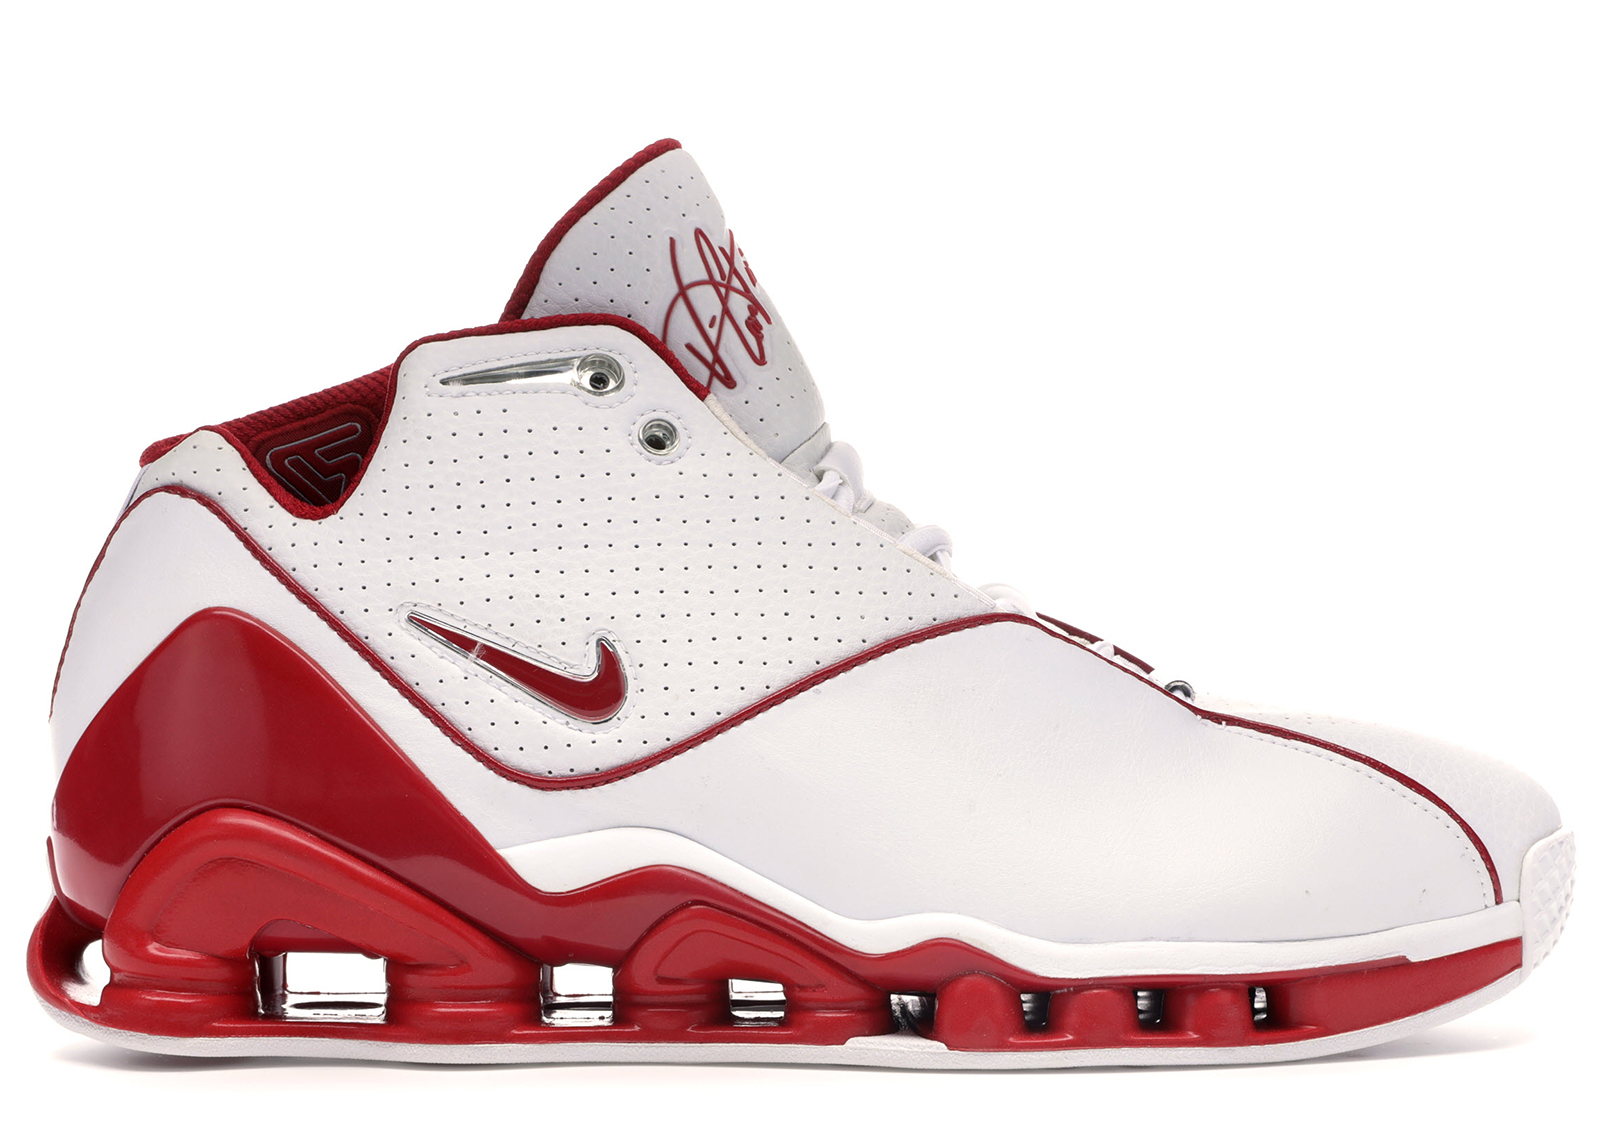 Nike Shox VC 2 White Red - 305078-161